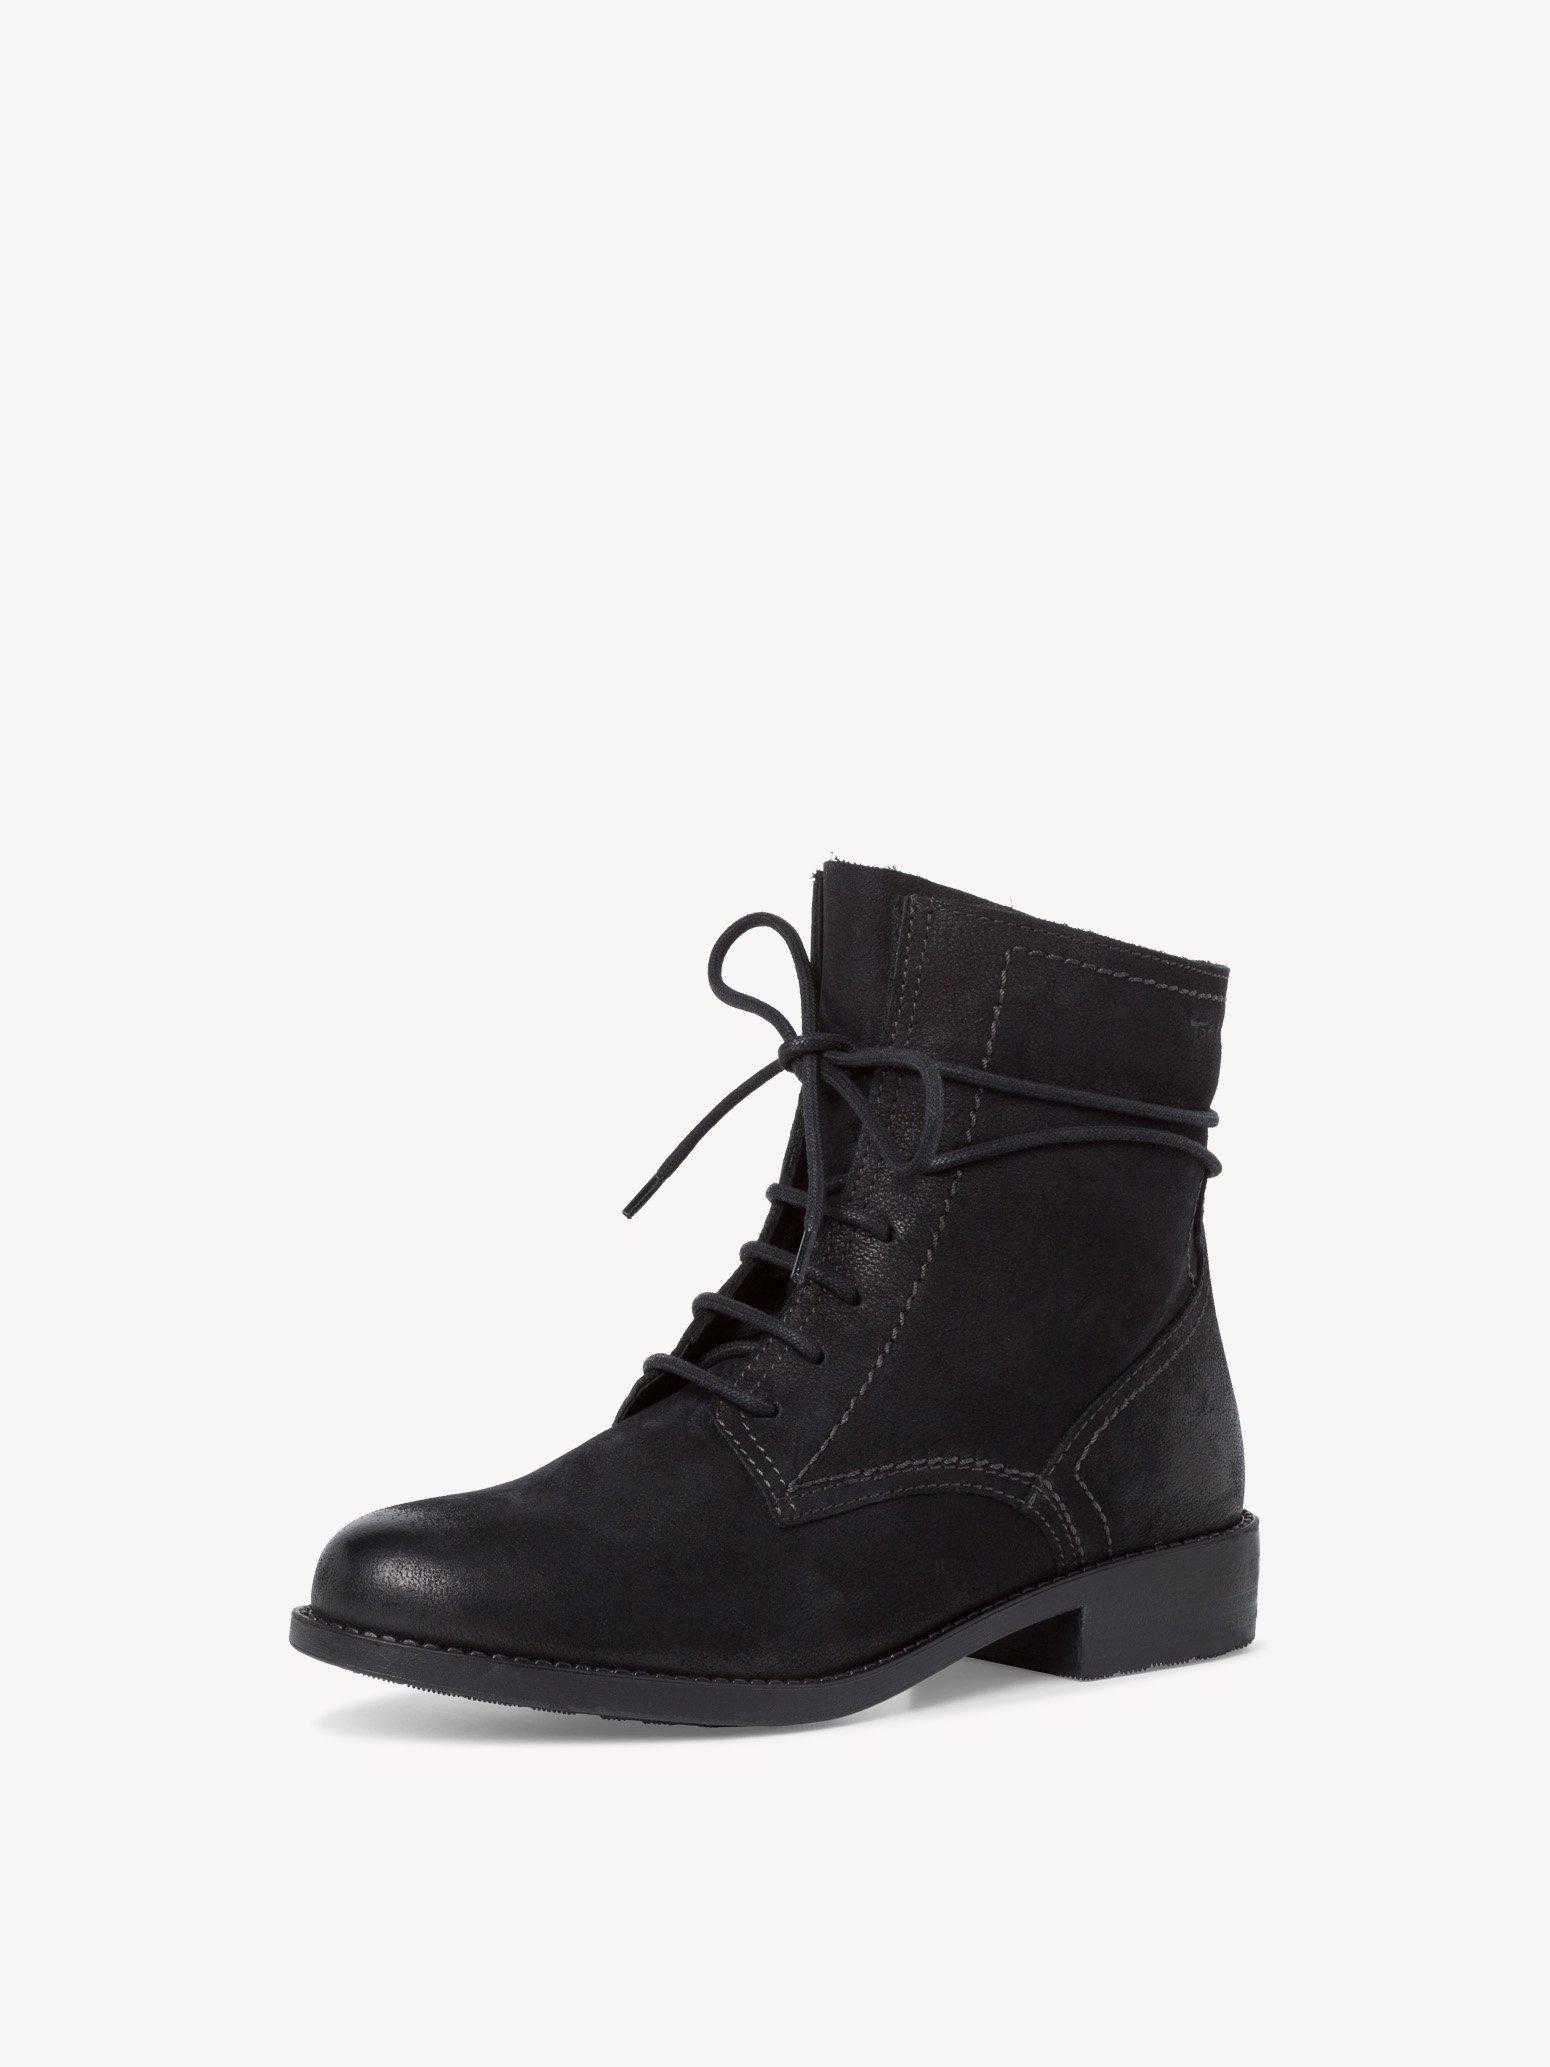 Ботинки Tamaris 1-1-25111-27-001